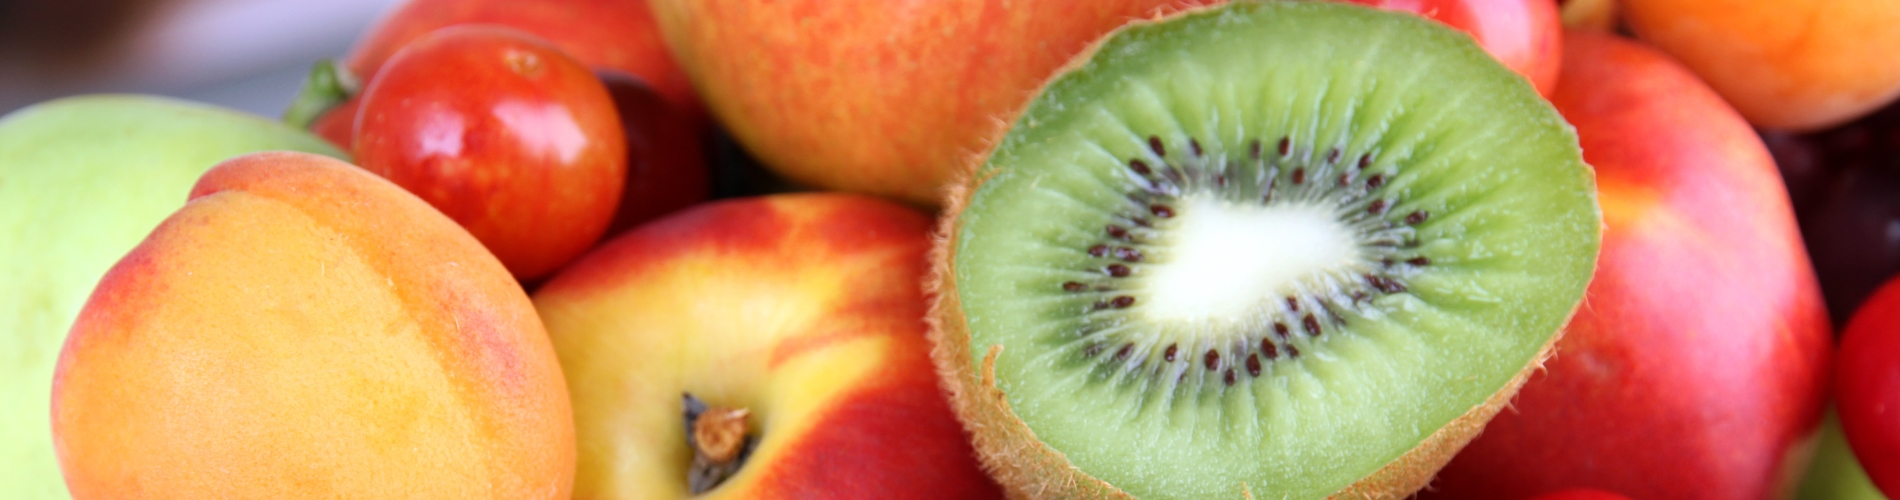 frutti-pr-1